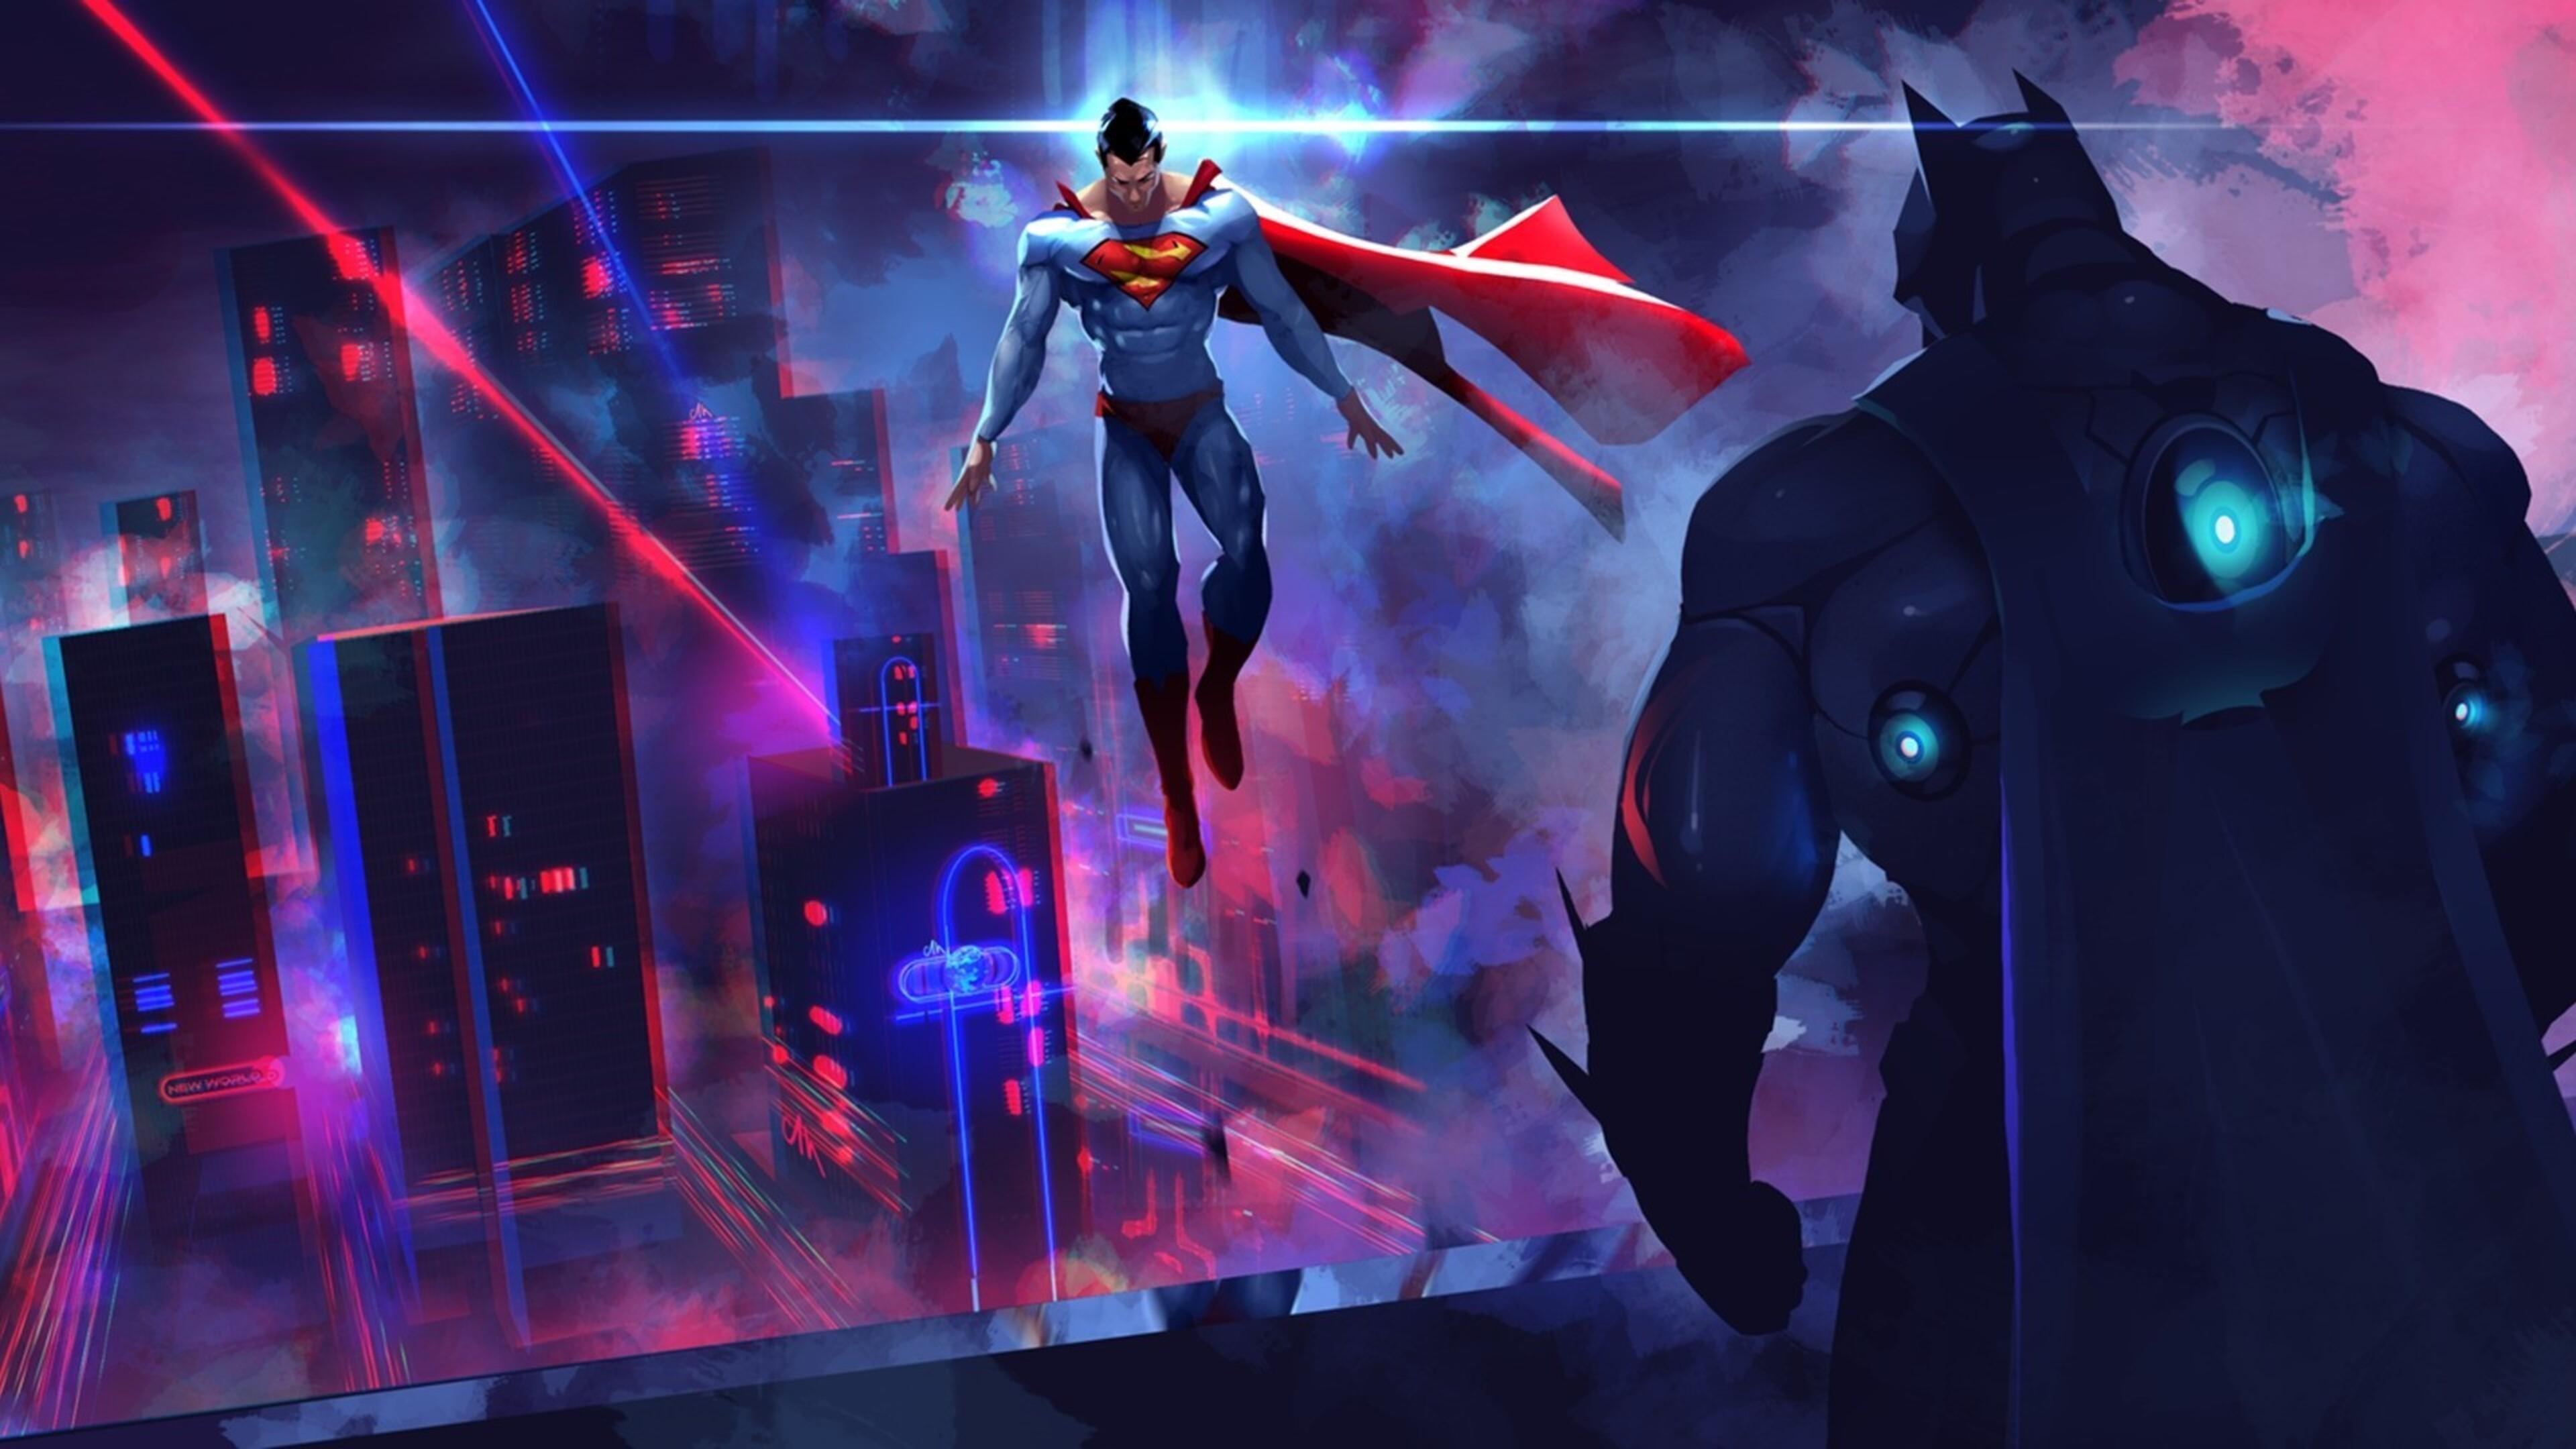 3840x2160 Batman Vs Superman Neon Lights Artwork 4k Hd 4k